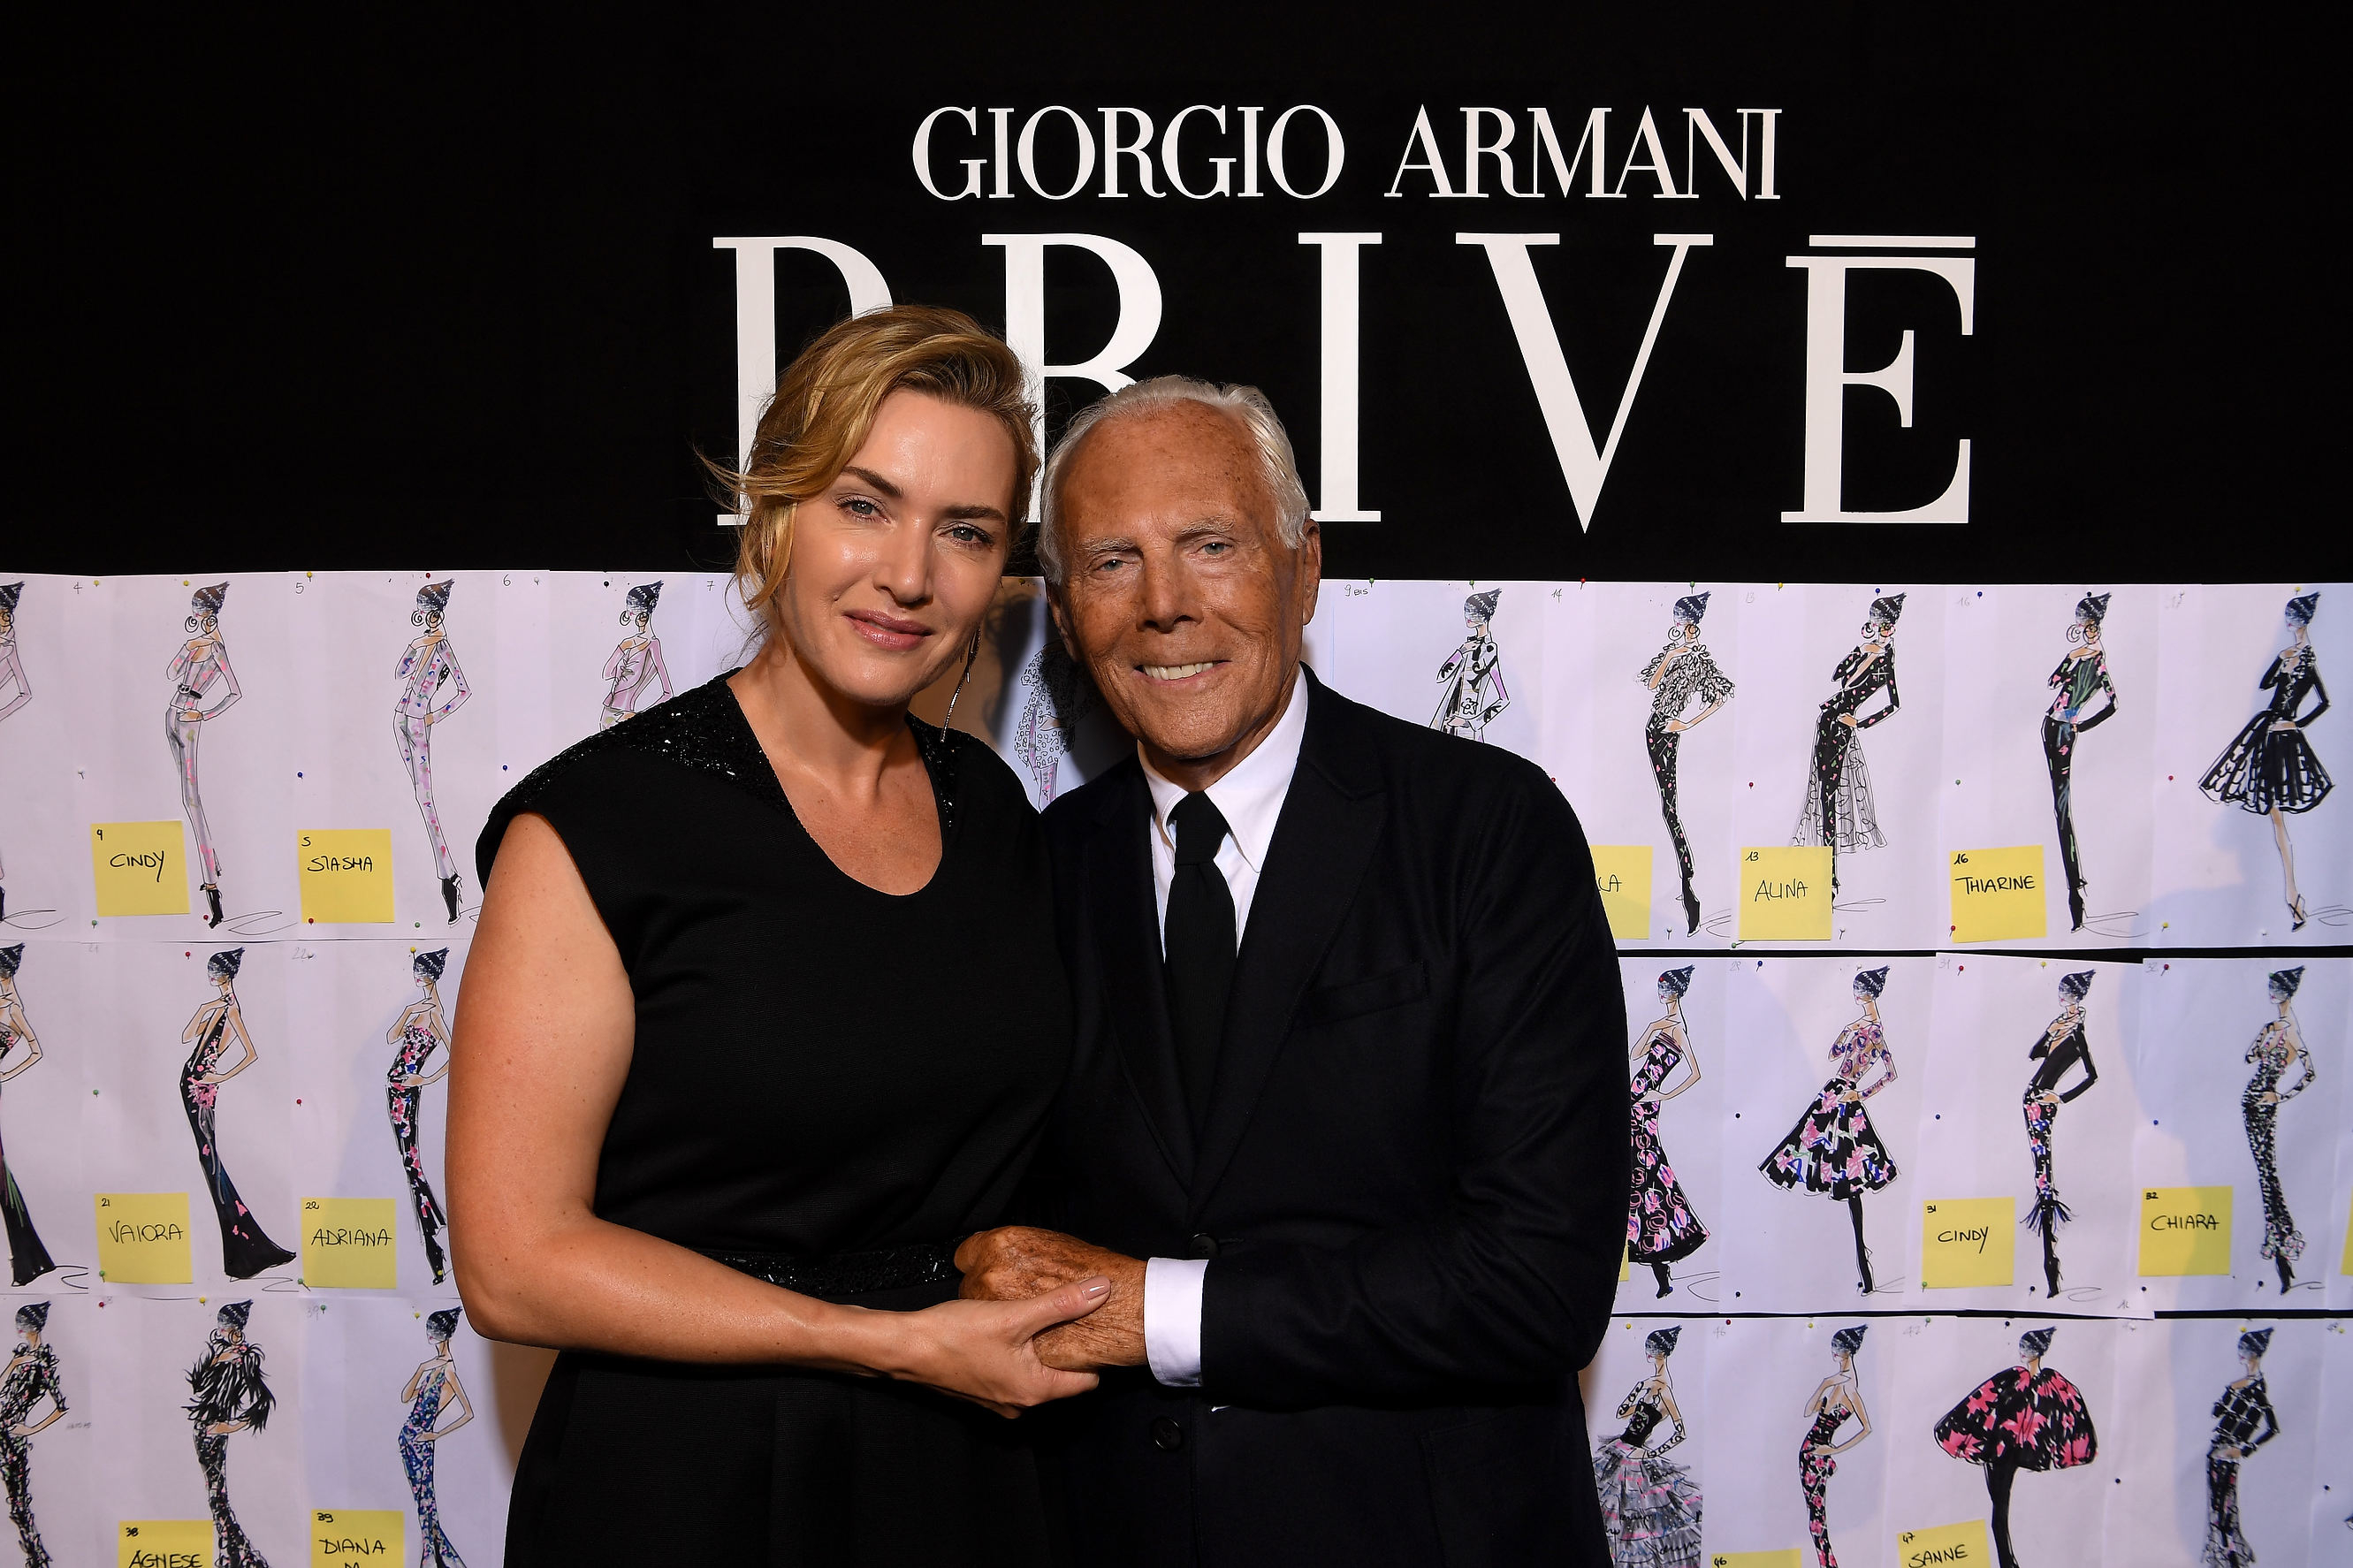 kate-winslet-and-giorgio-armani_sgp